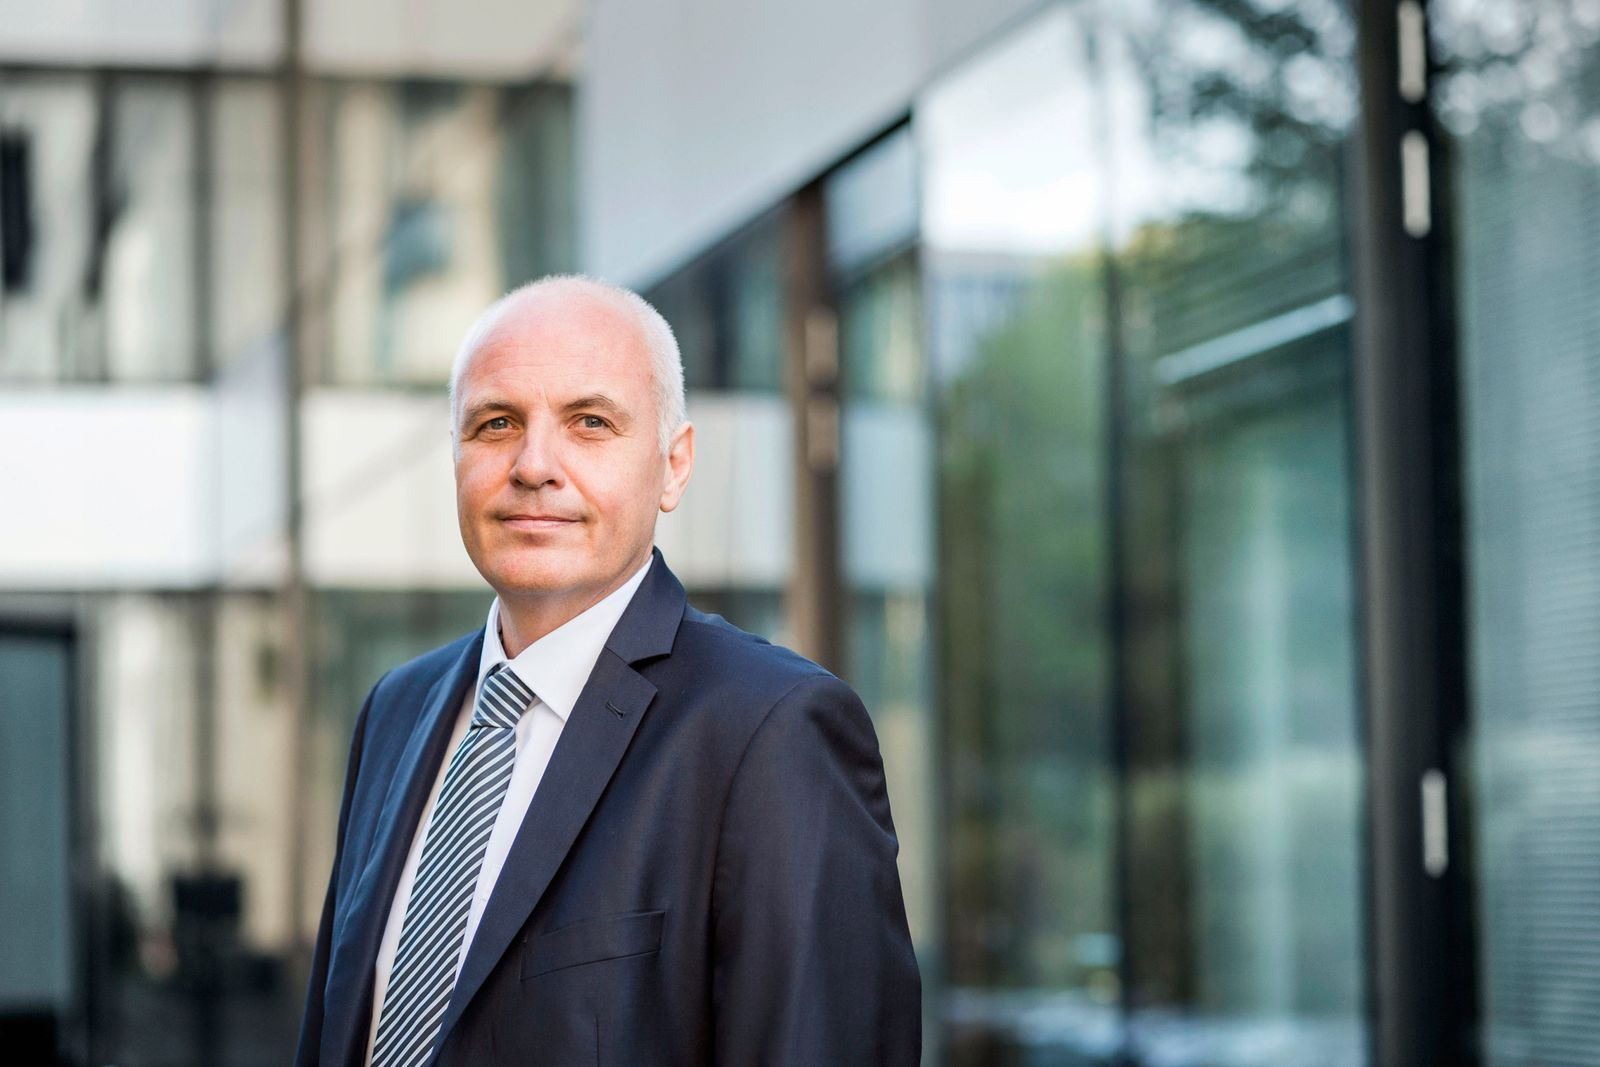 Matthias Gründler